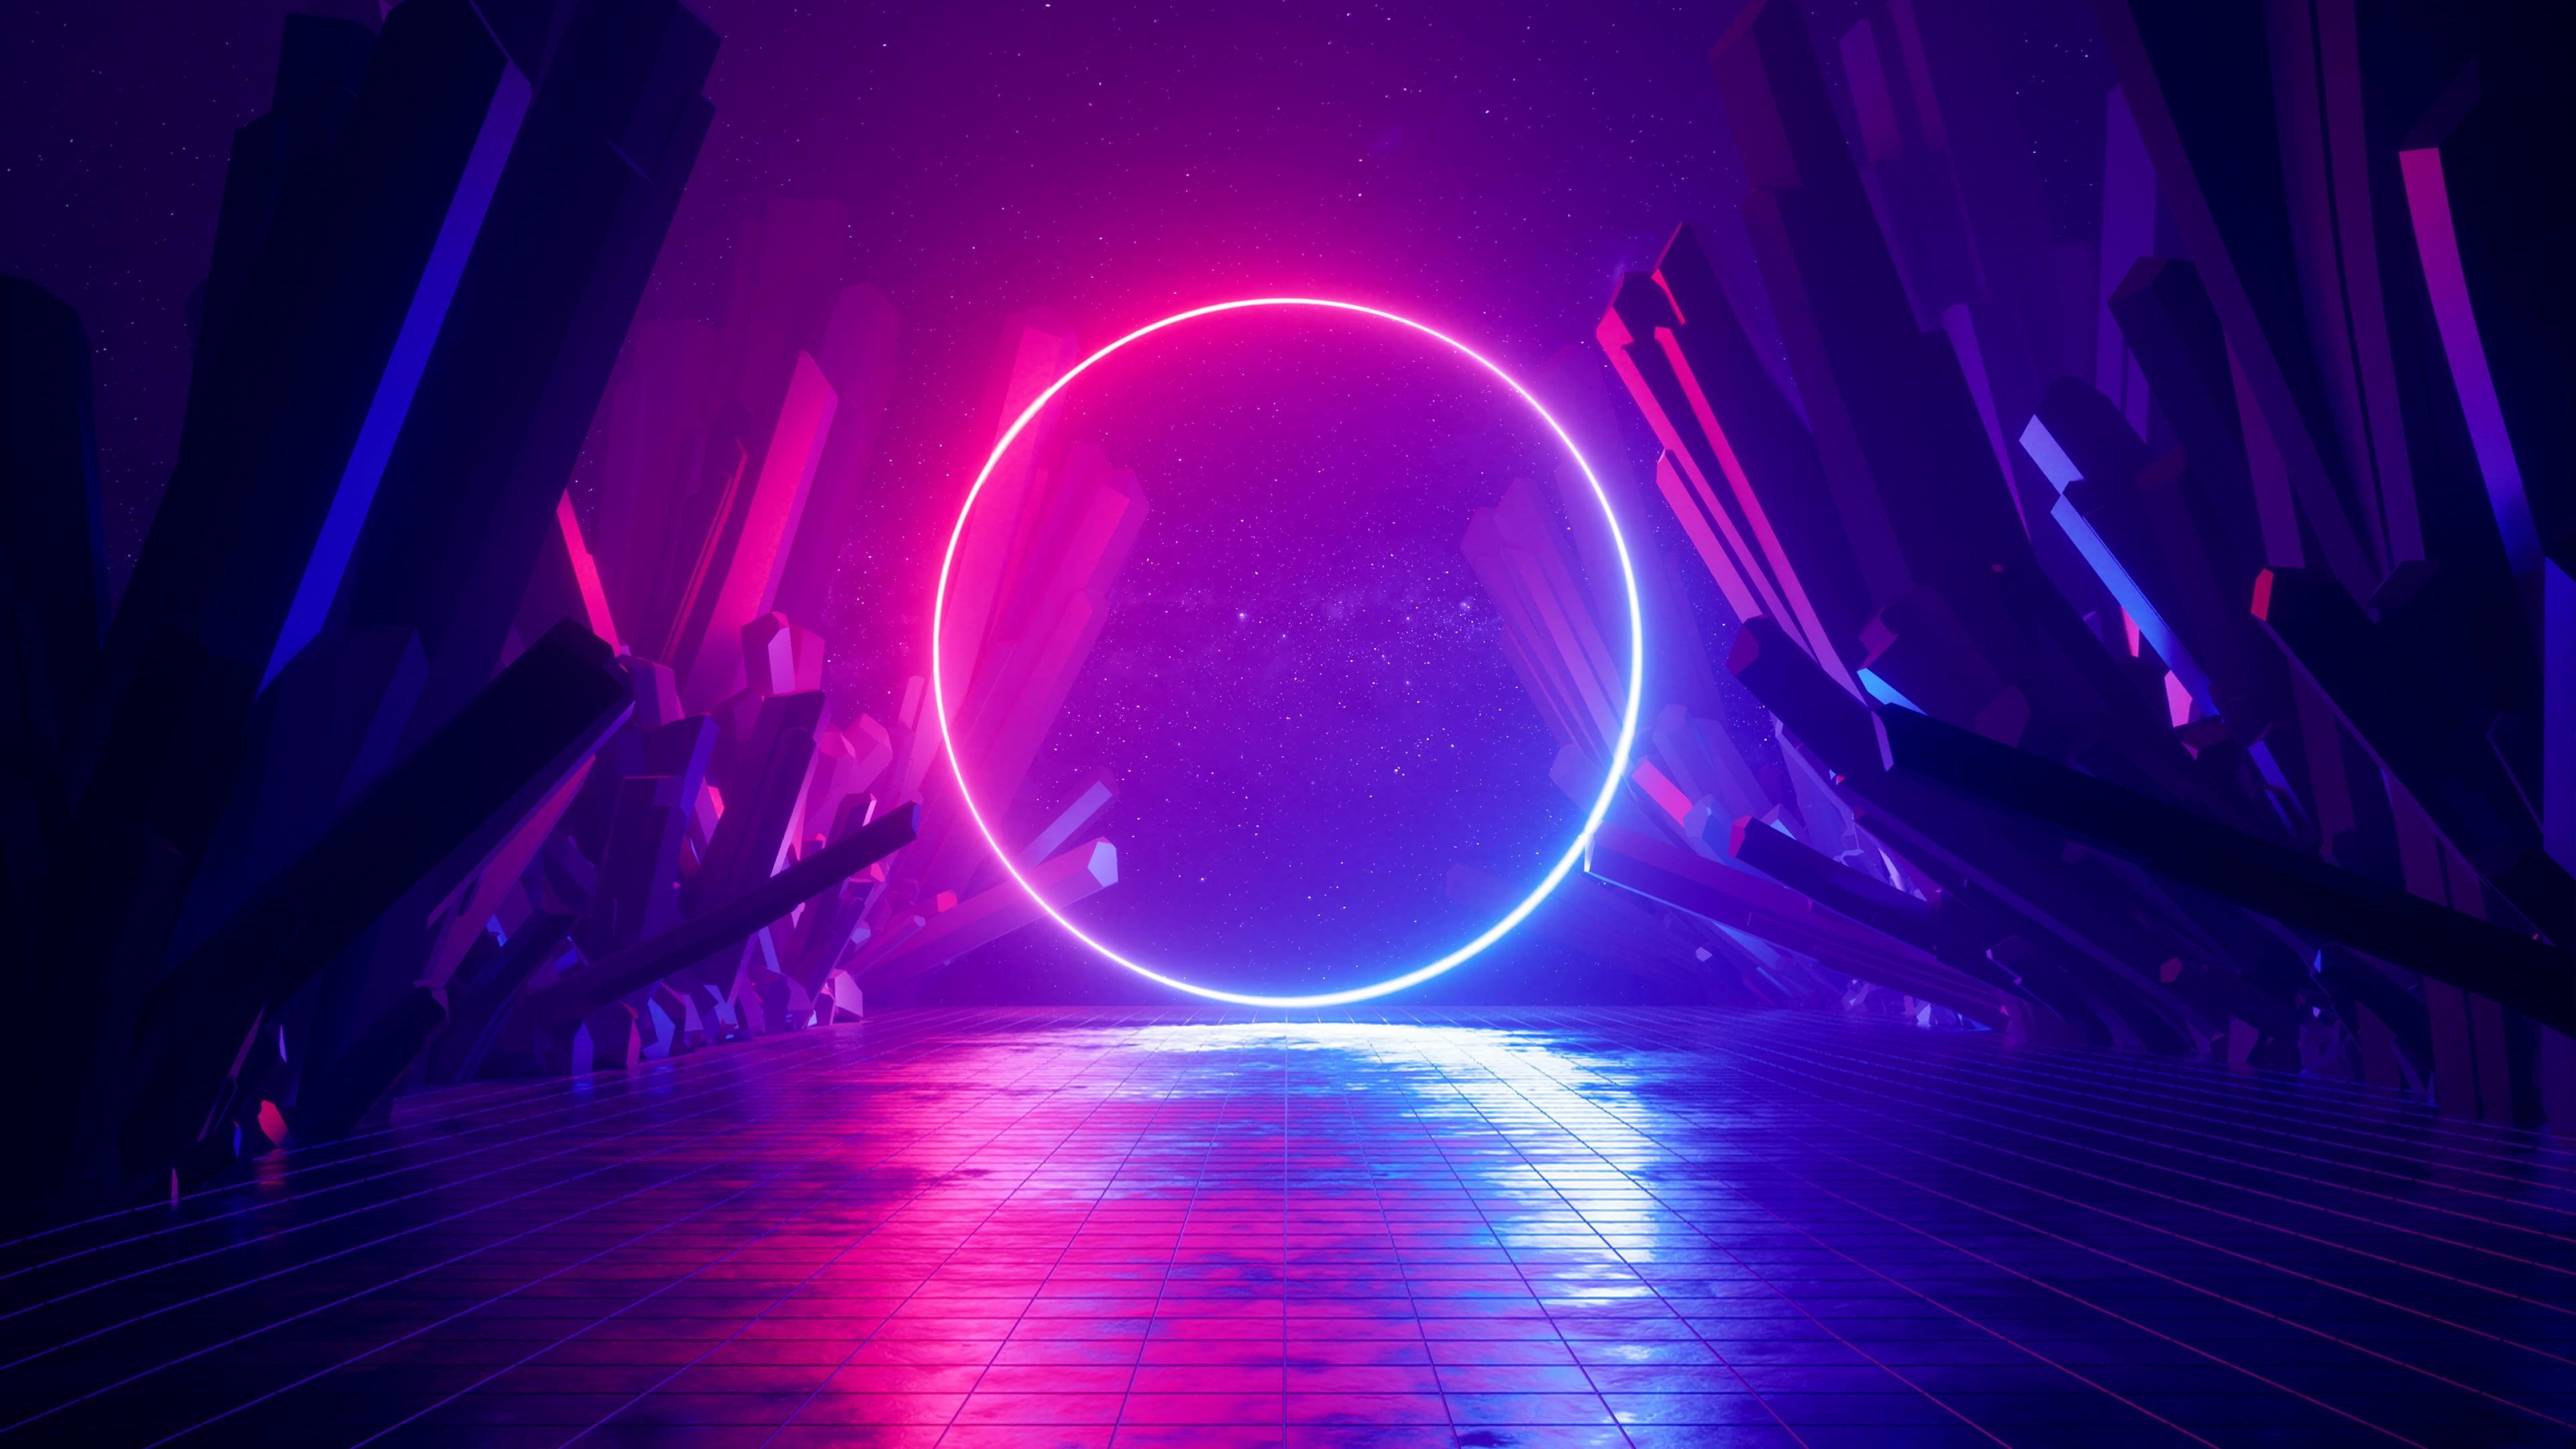 neon ring wallpaper